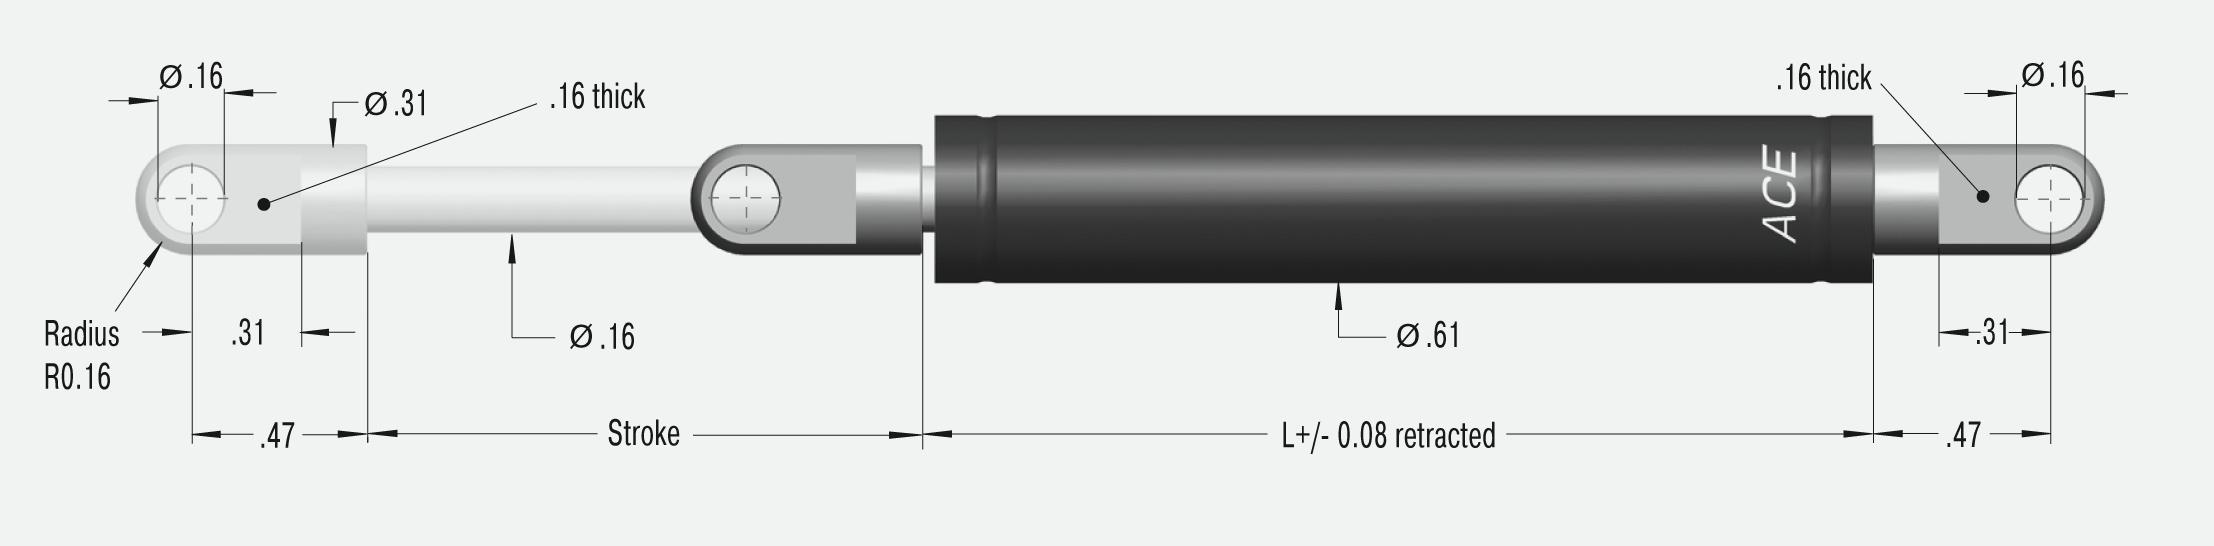 GZ-15-150